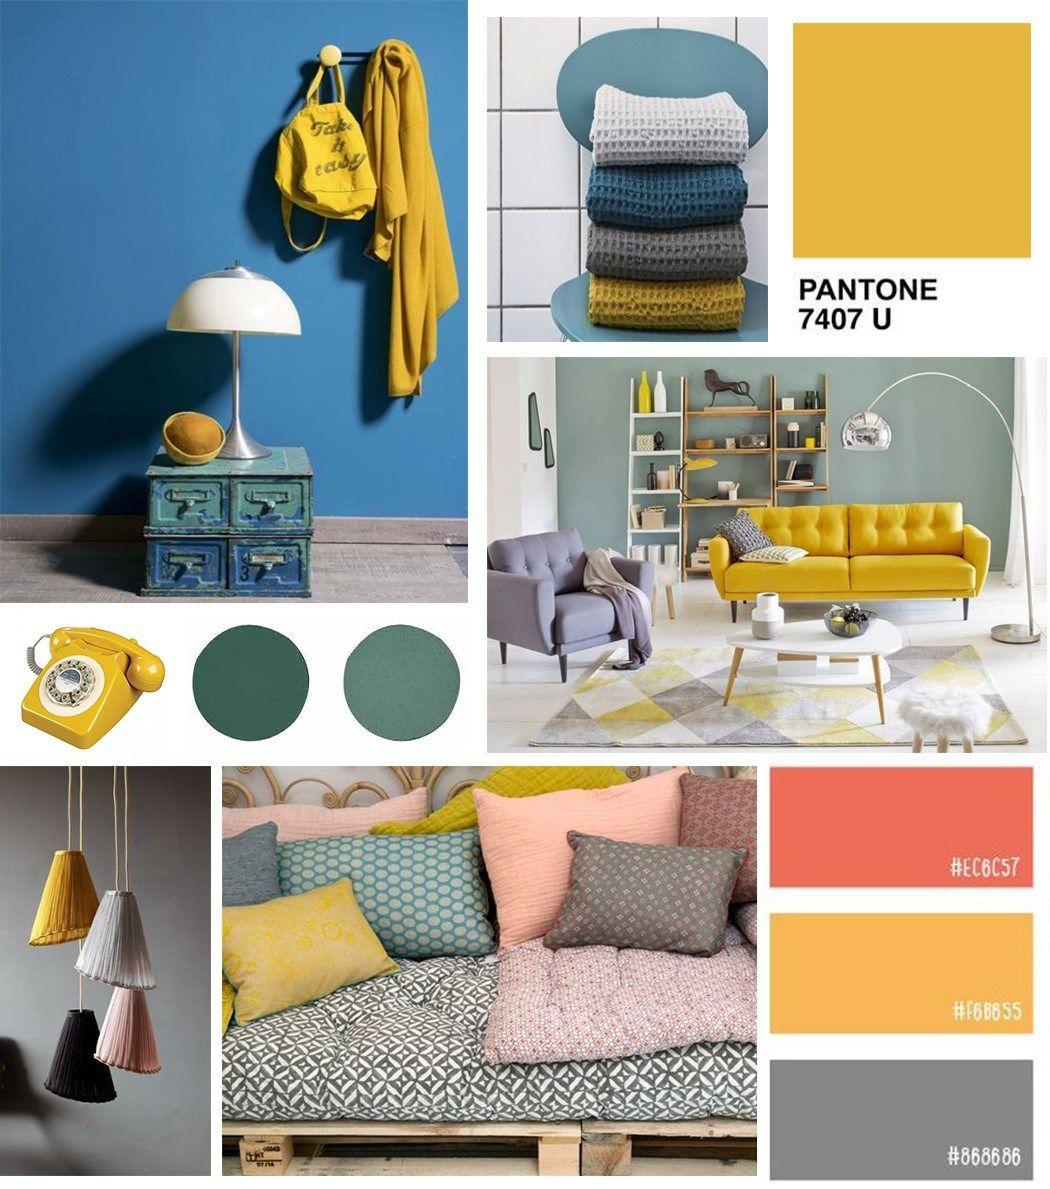 jaune moutarde association avec autres couleurs v2 couleur pinterest mustard salons and. Black Bedroom Furniture Sets. Home Design Ideas